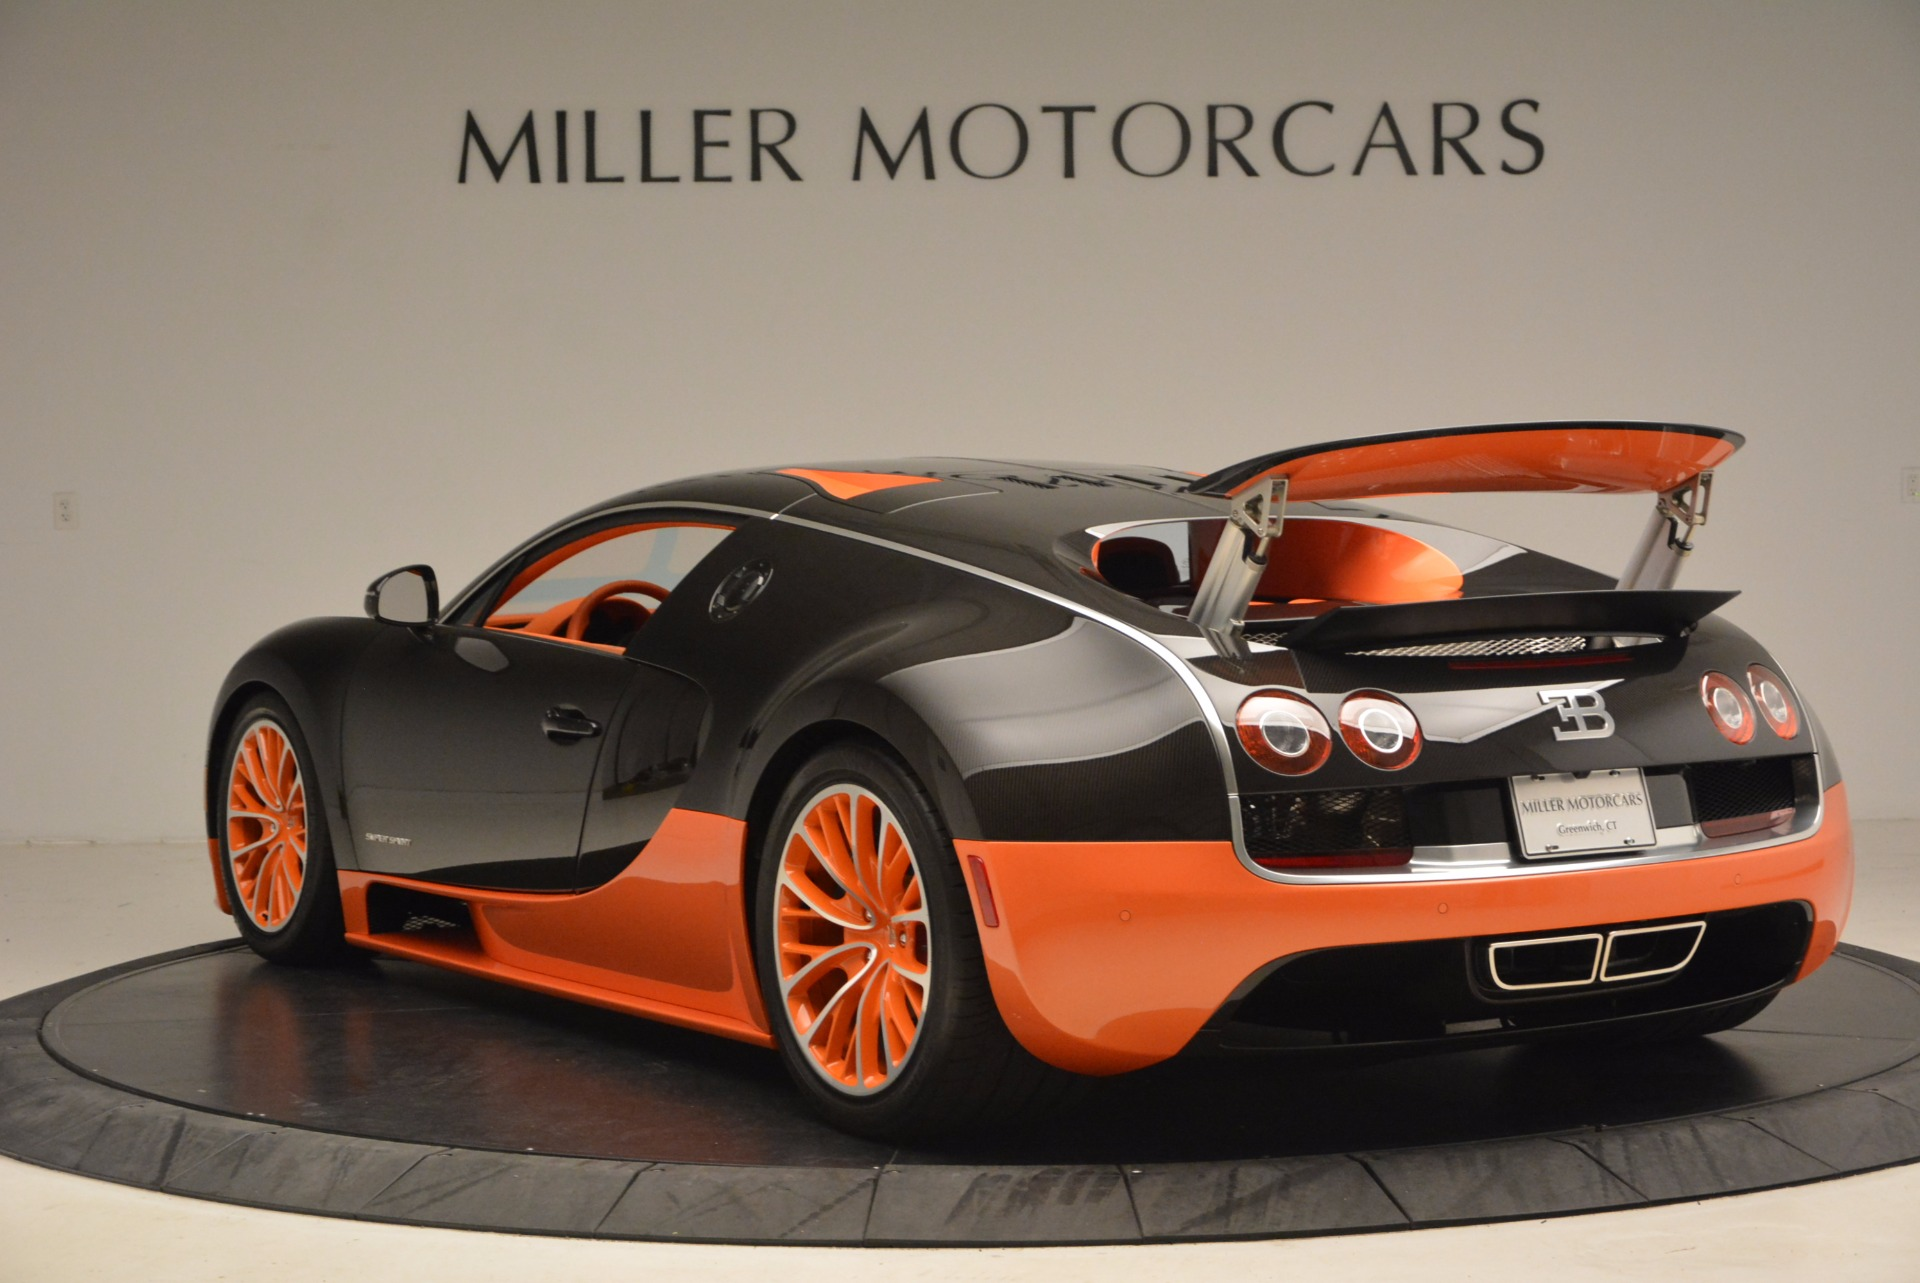 Pre-Owned 2012 Bugatti Veyron 16.4 Super Sport For Sale () | Miller Motorcars Stock #7244C